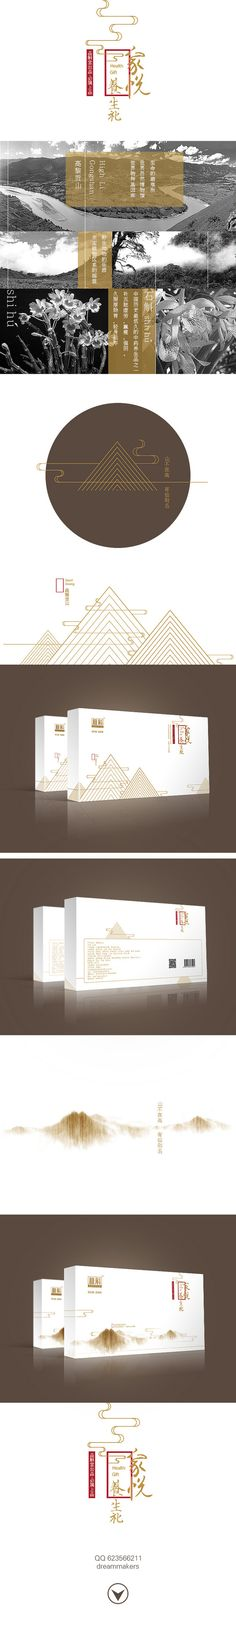 line art done well Web Design, Plane Design, Layout Design, Creative Design, Design Art, Branding And Packaging, Packaging Design, Branding Design, Logo Design